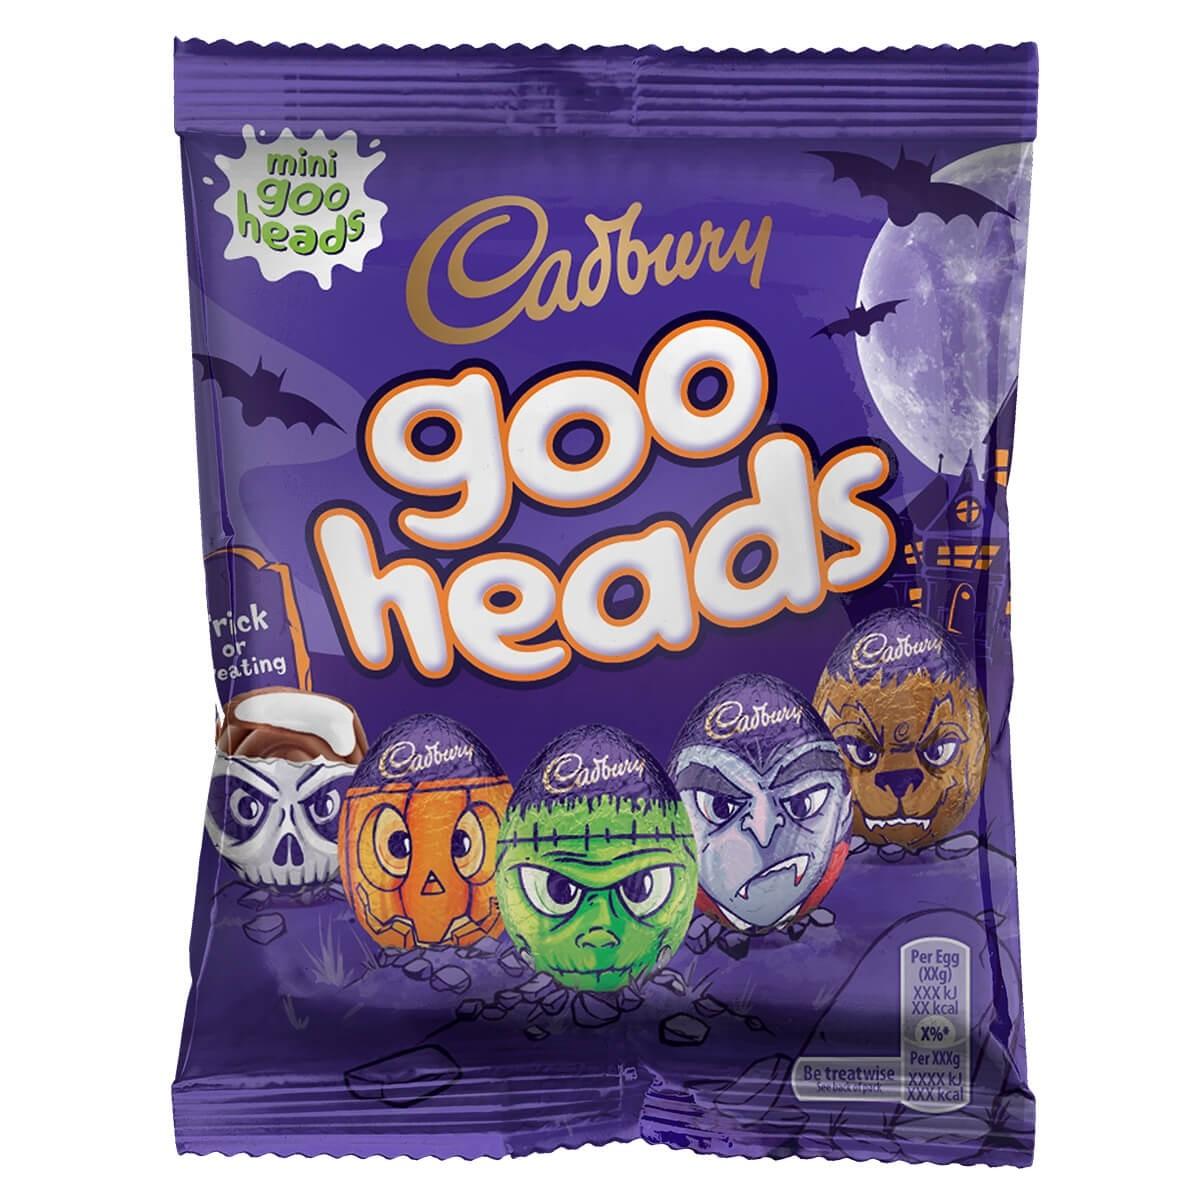 CADBURY GOO HEADS CREME EGGS MINIS 89G 30p + £3.95 delivery @ Cadbury Gifts Direct